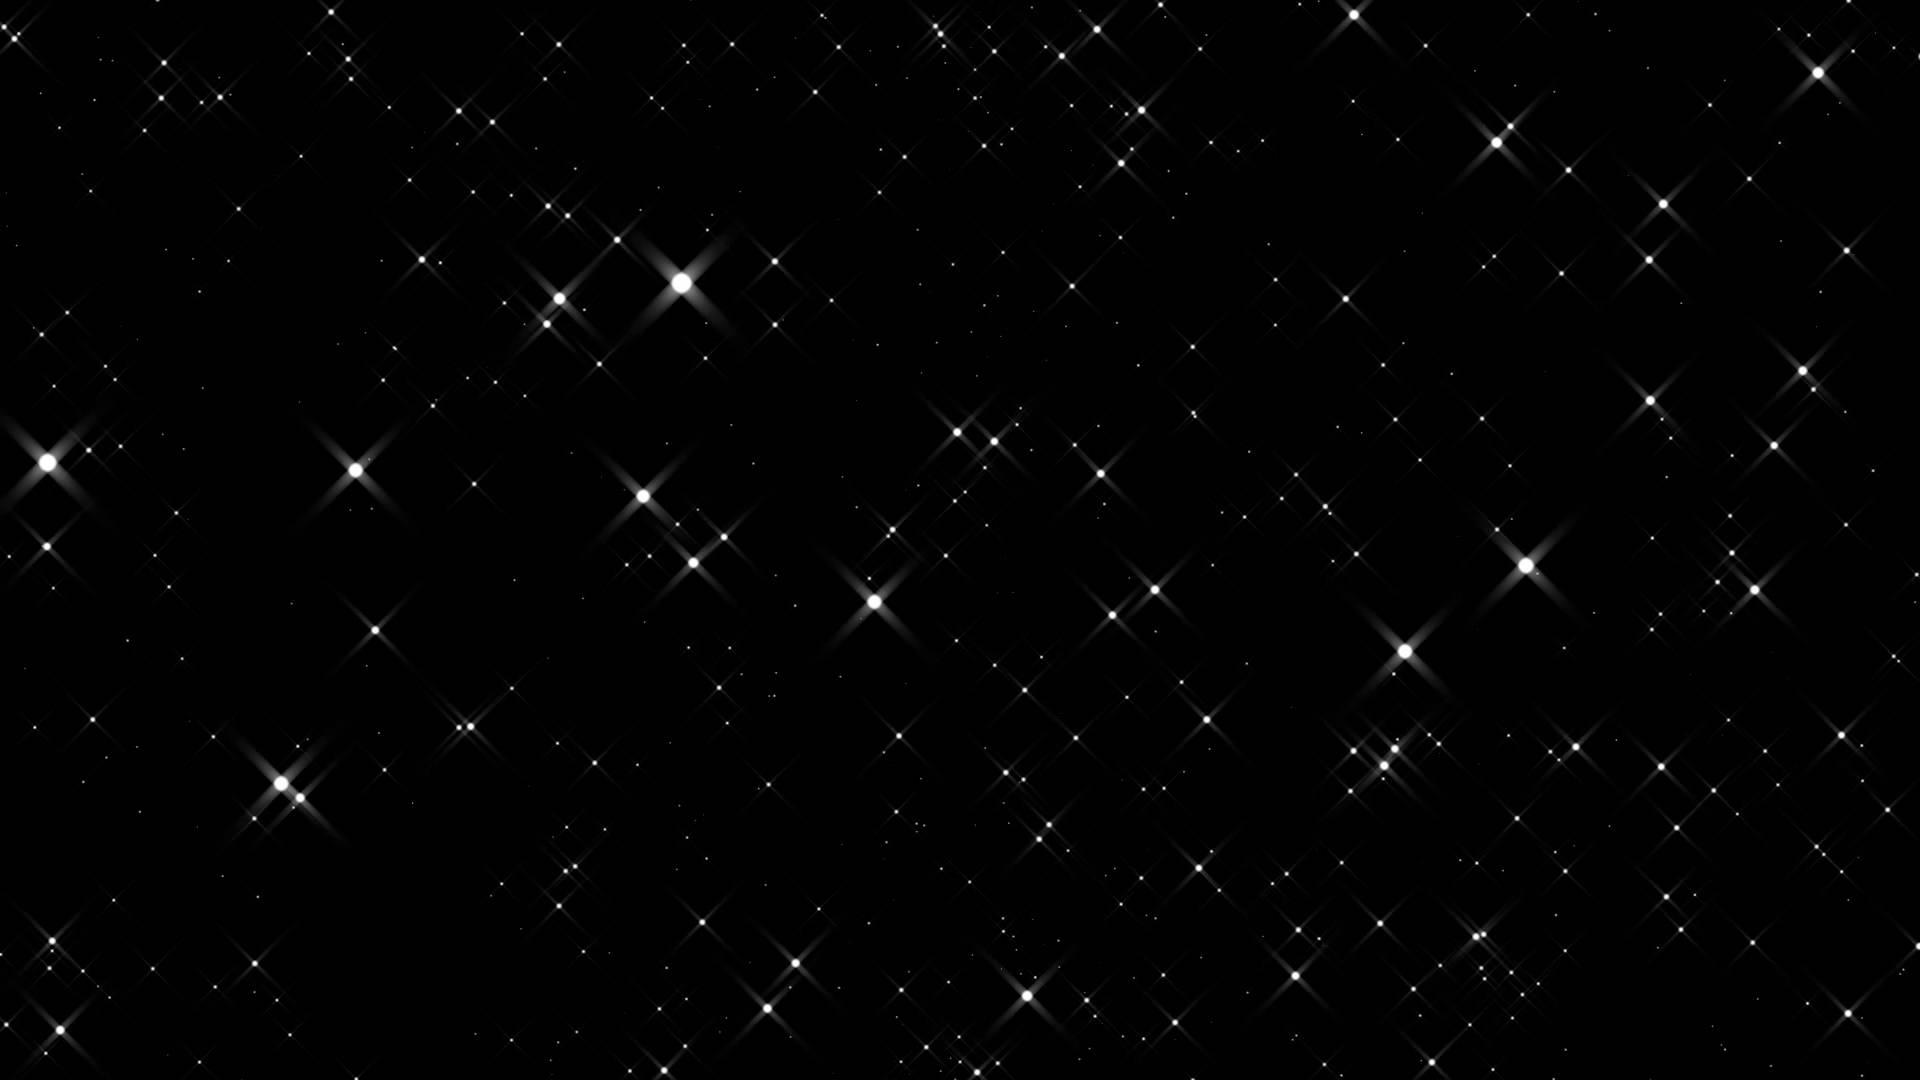 transparent black background - HD1920×1080